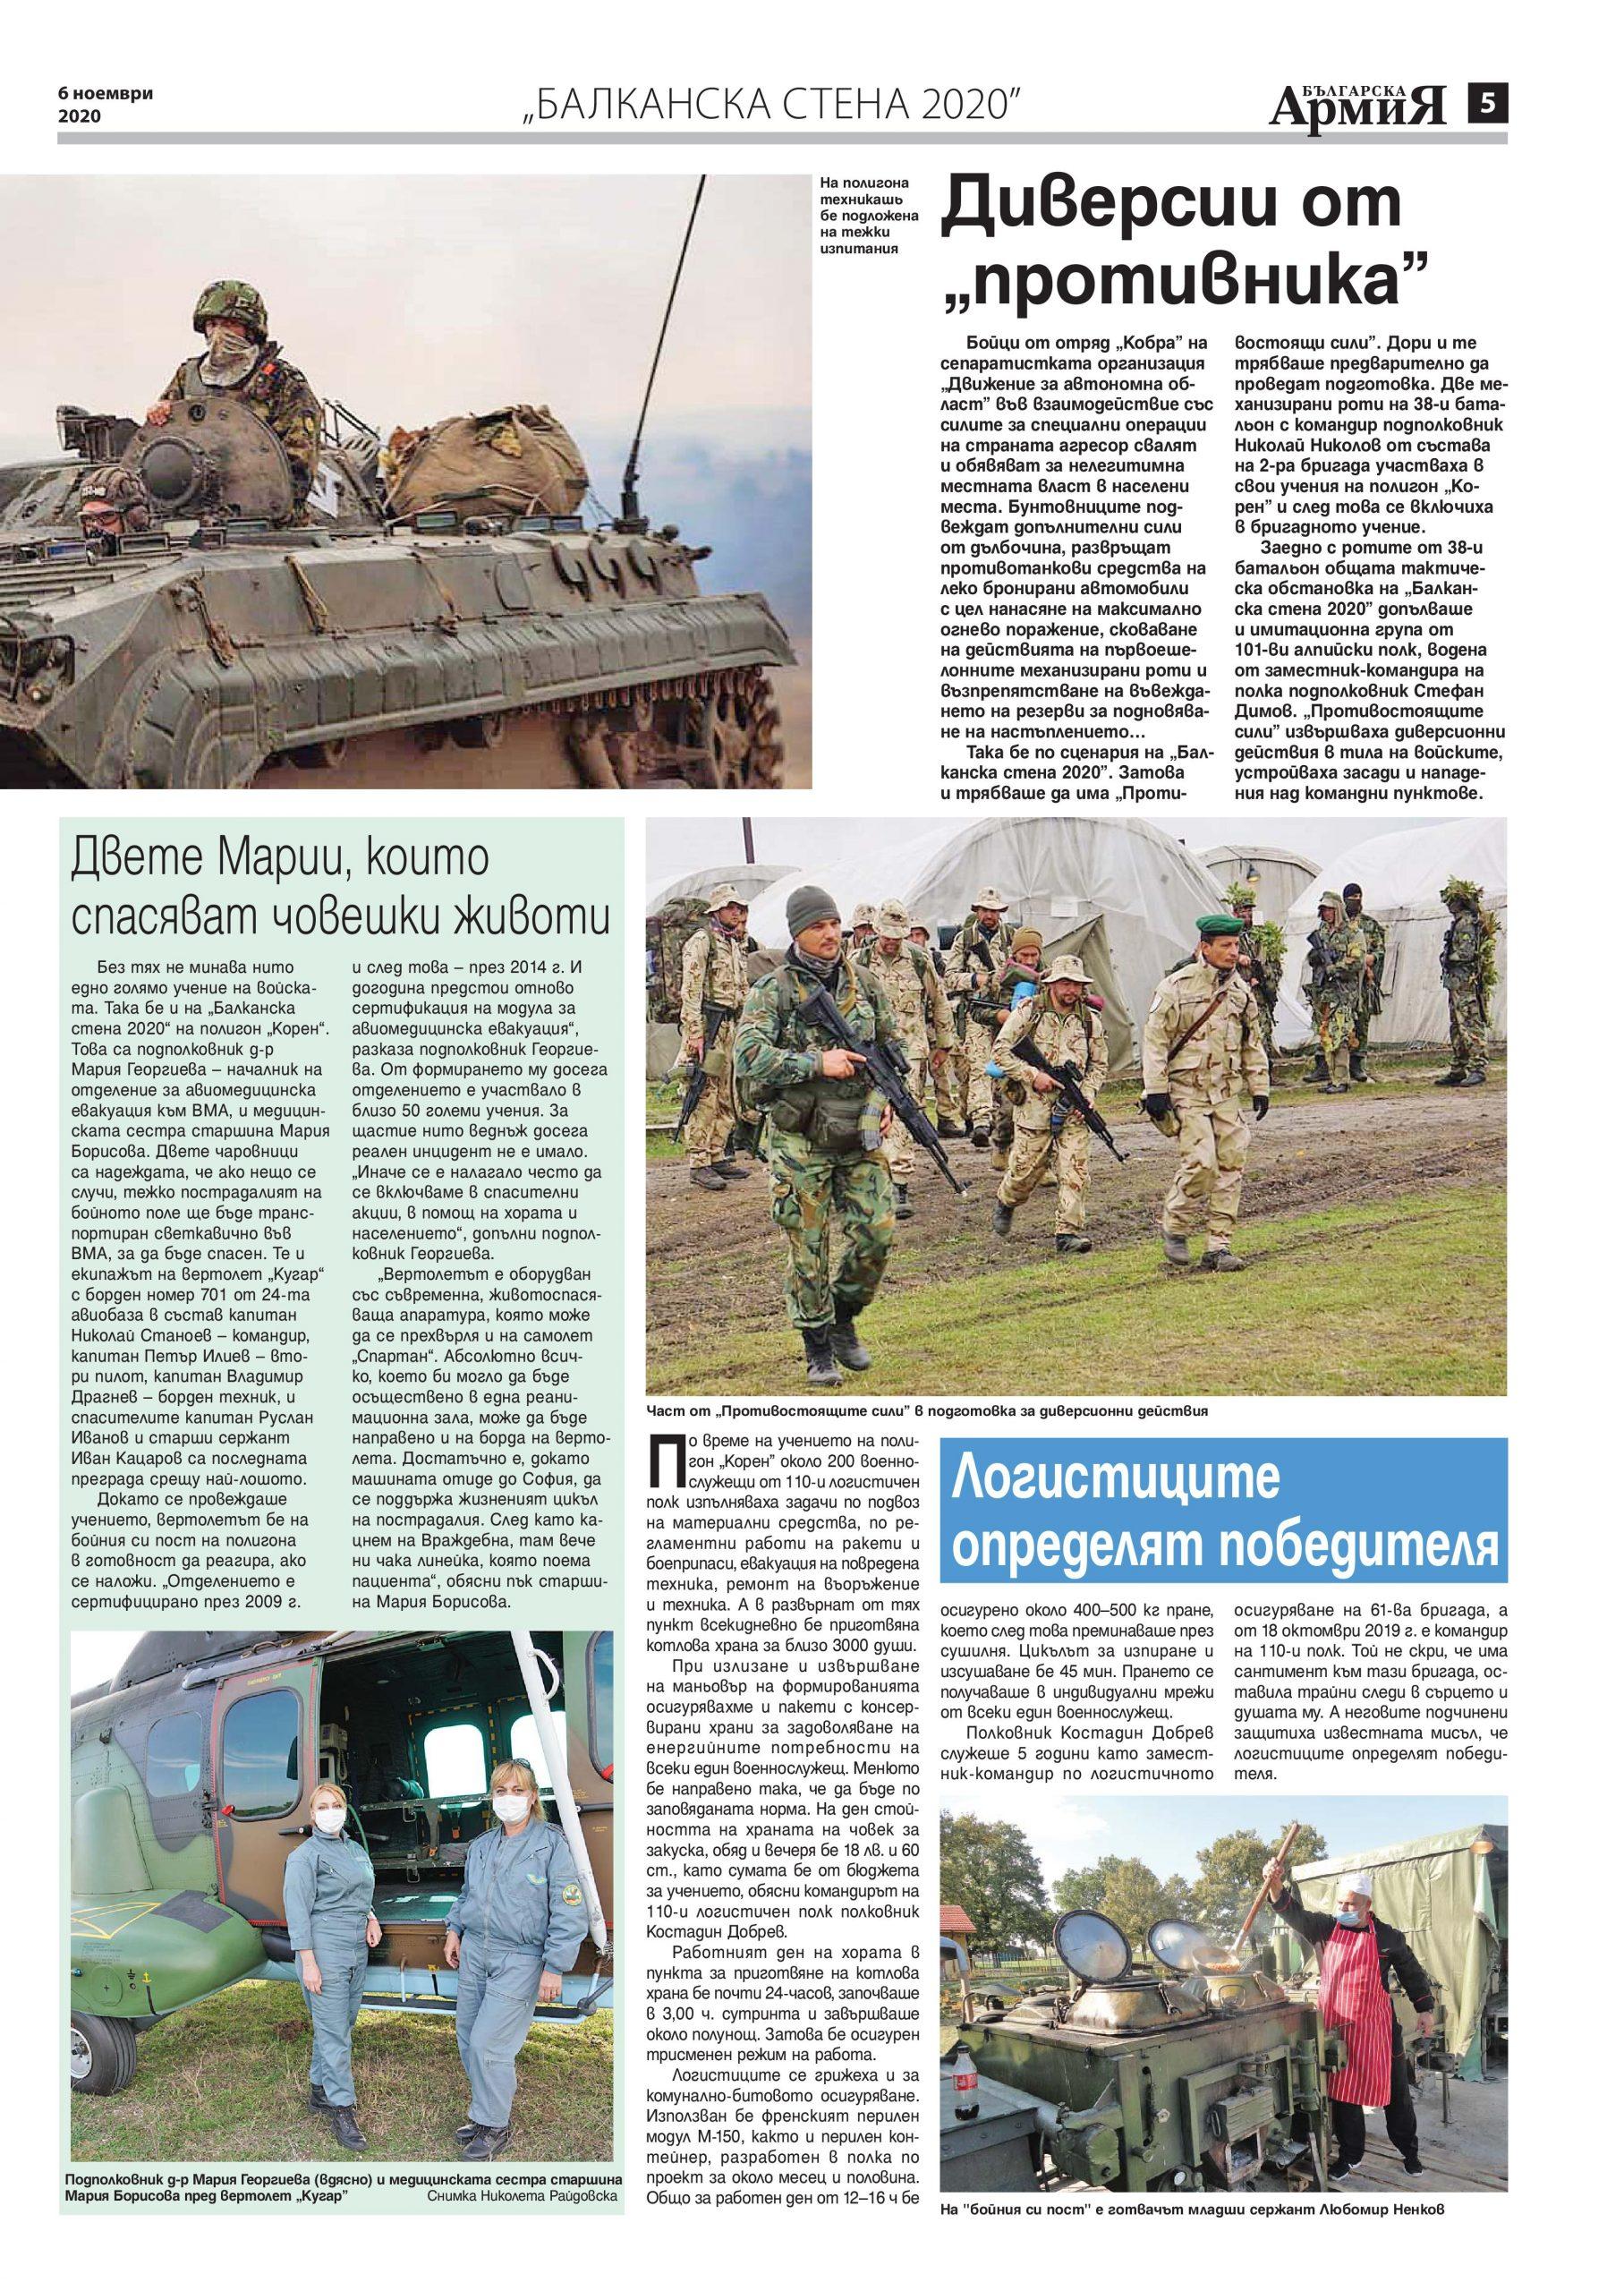 https://armymedia.bg/wp-content/uploads/2015/06/05-46-scaled.jpg